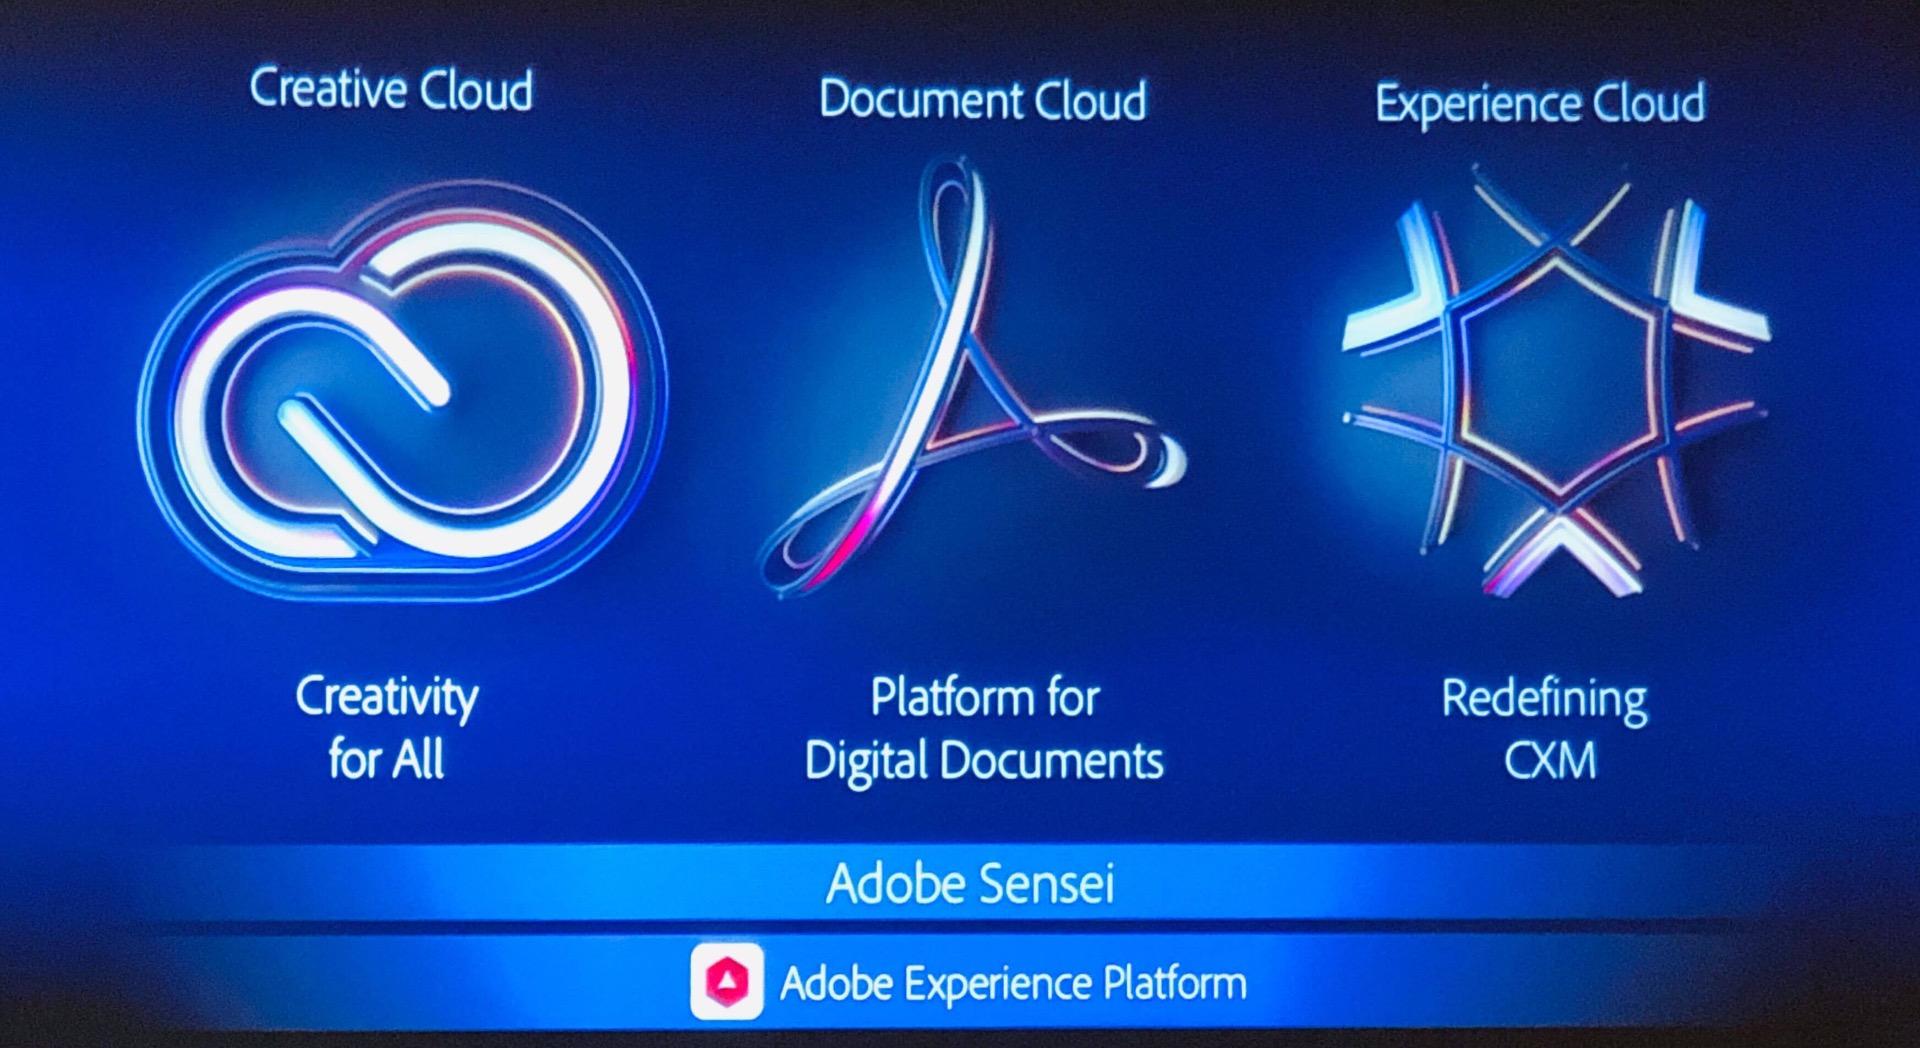 Adobe Experience Platform